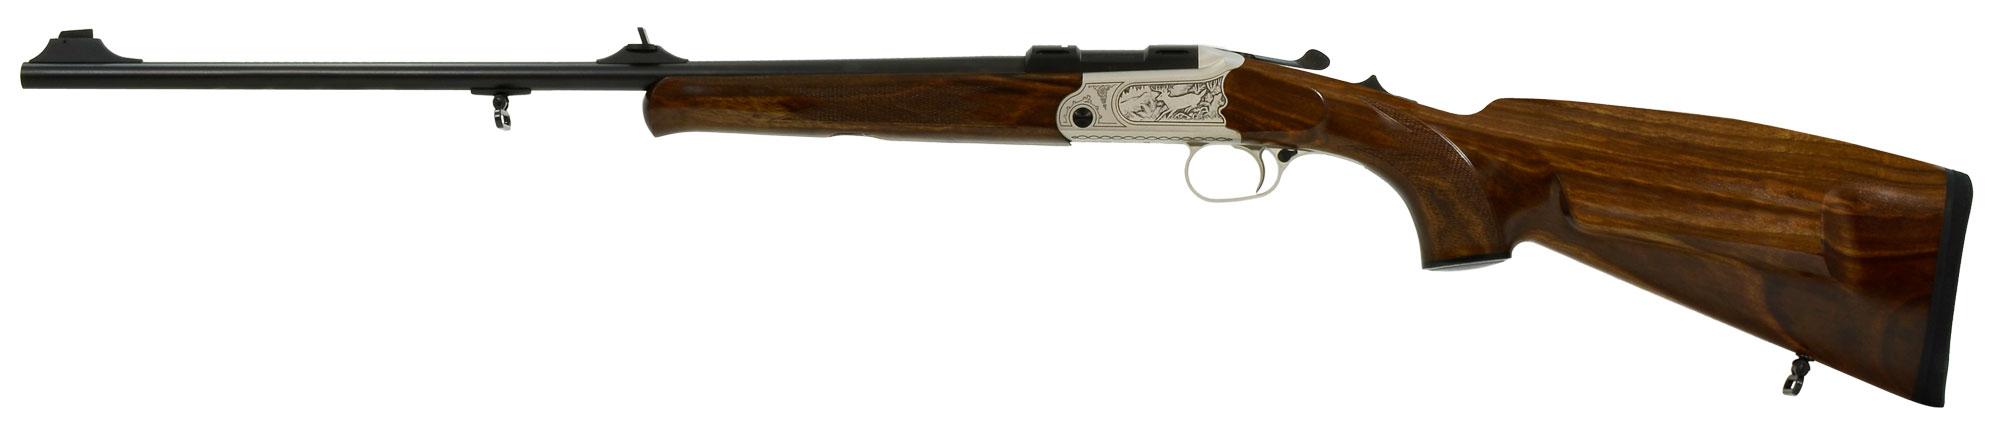 Merkel K3 Jagd 270 Win Single Shot Rifle K3-Jagd-270